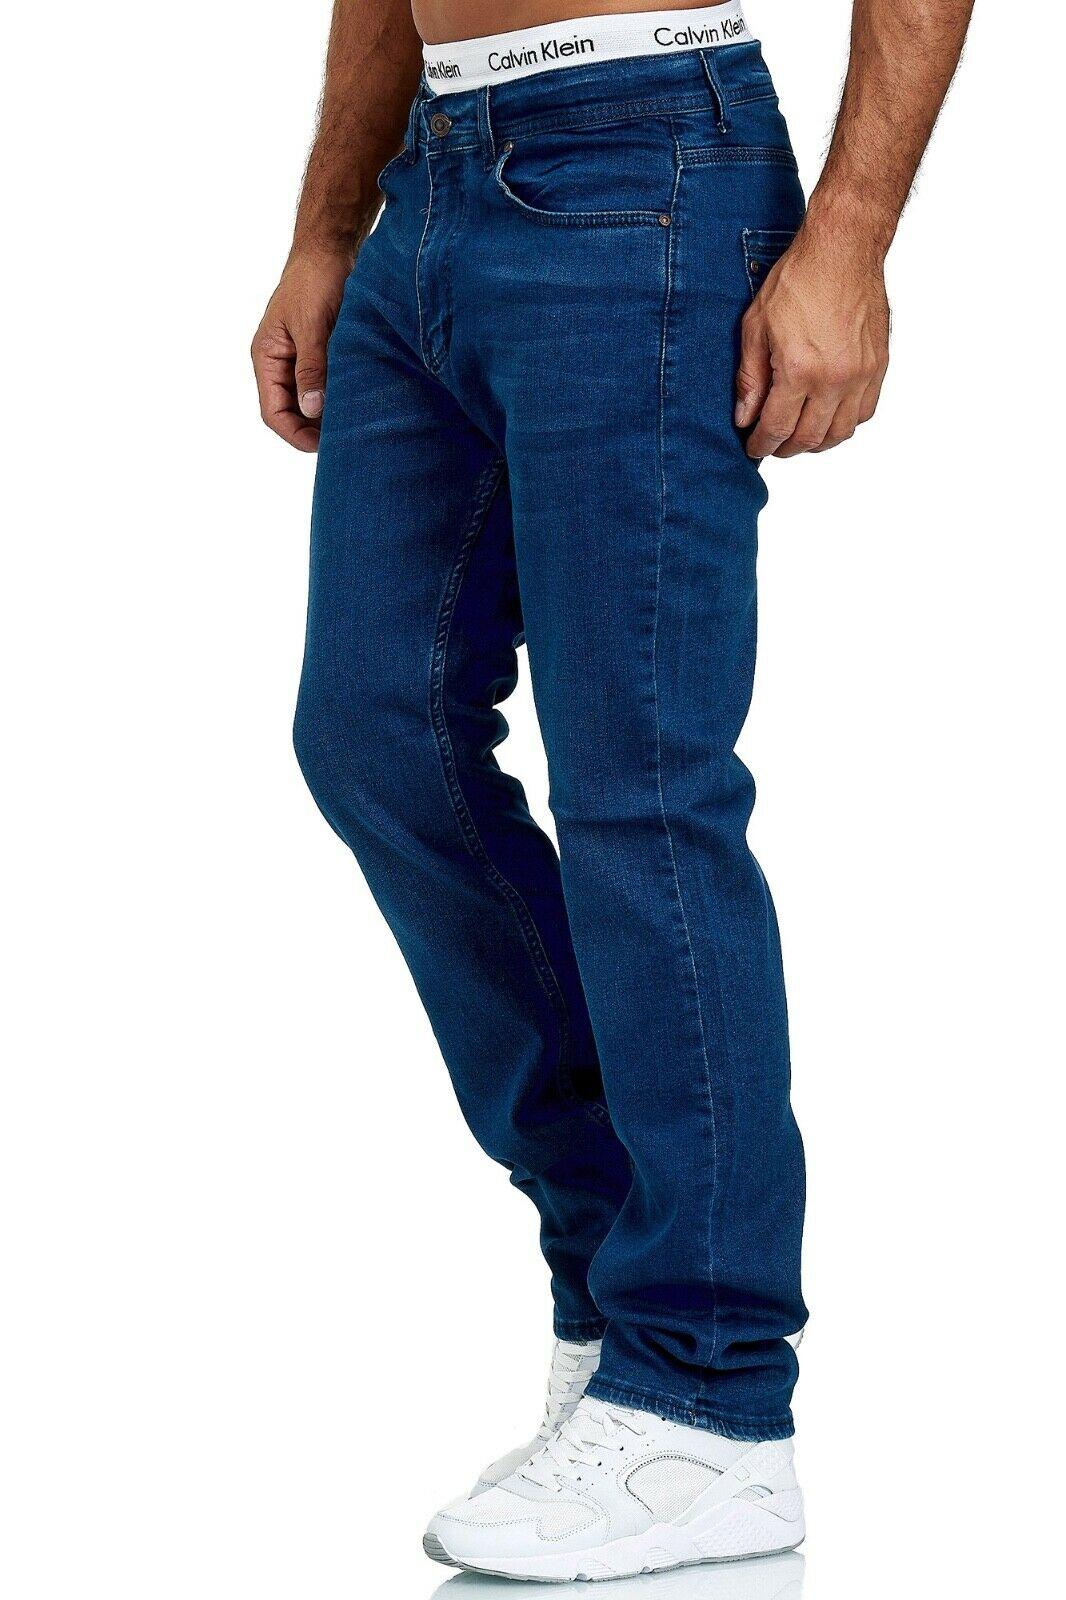 Herren-Jeans-Hose-Denim-KC-Black-Washed-Straight-Cut-Regular-Dicke-Naht-naehte Indexbild 32